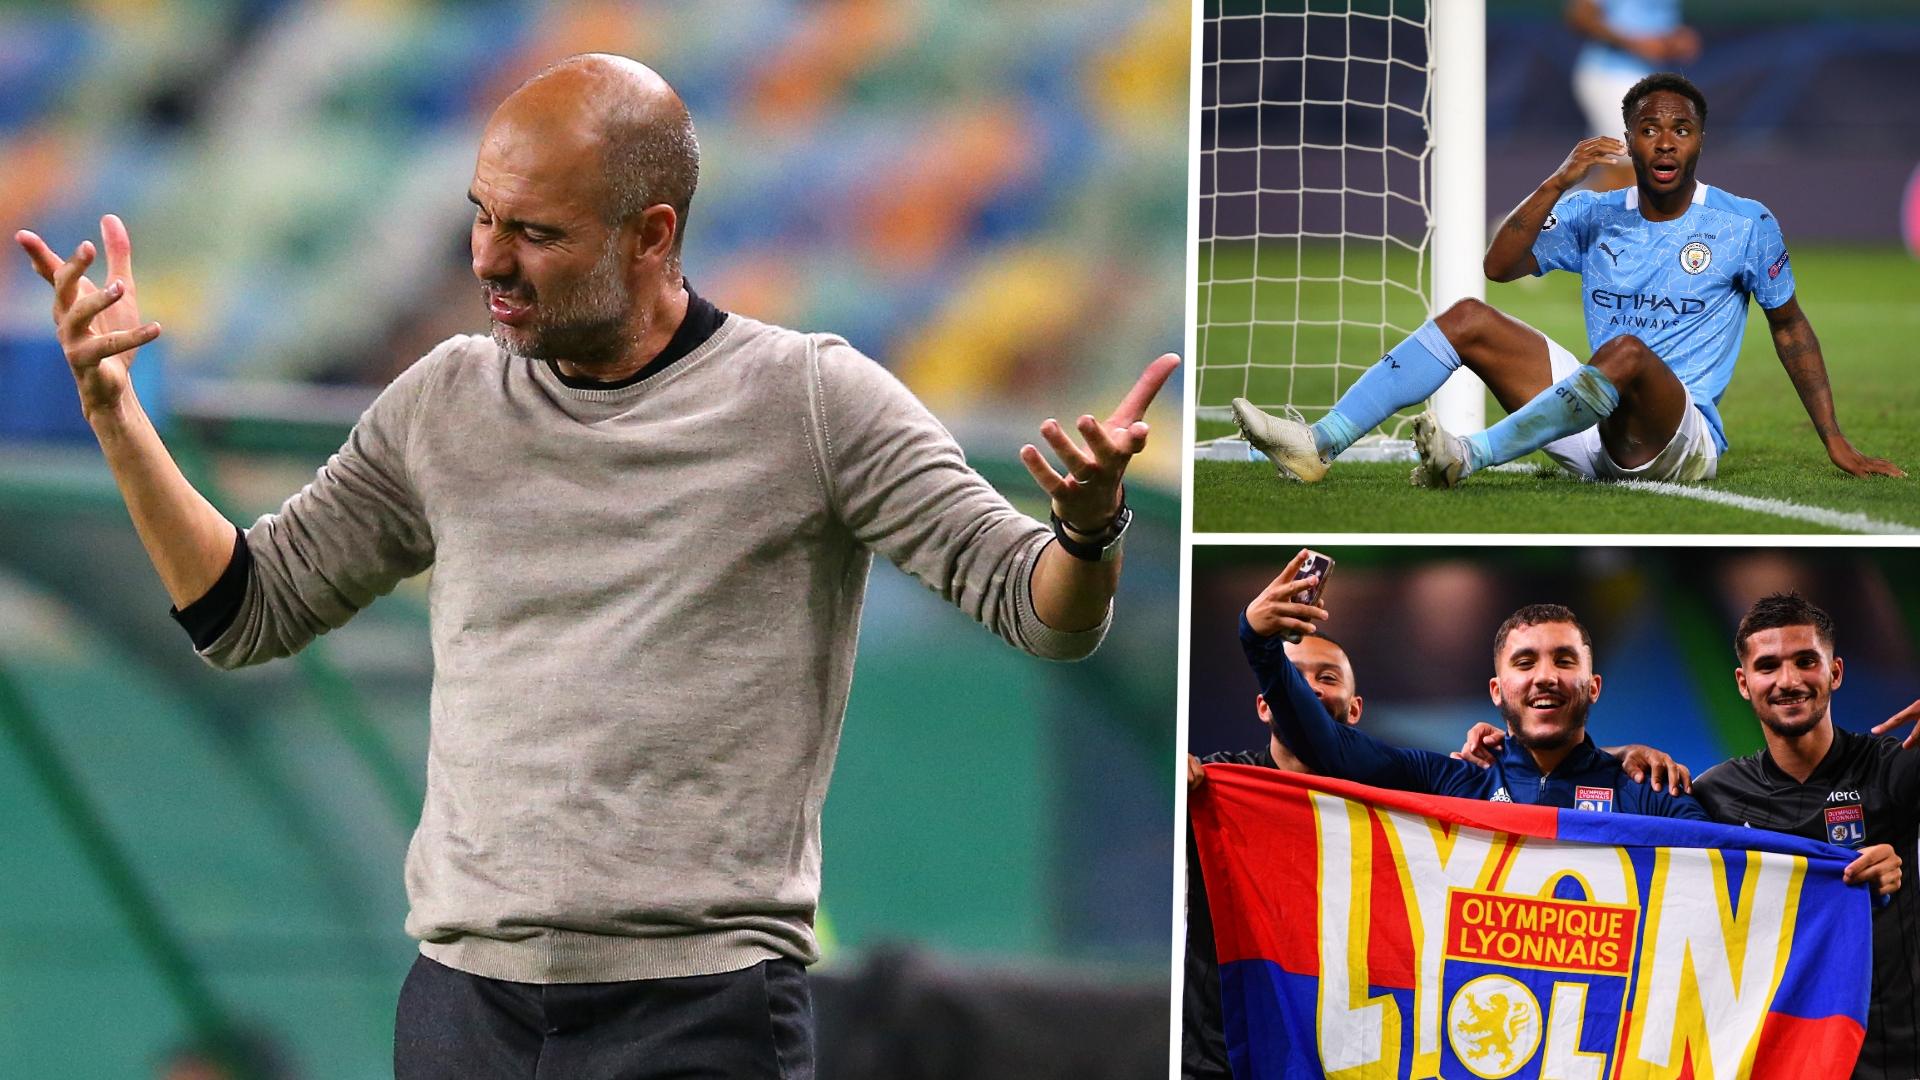 Lyon's two-goal hero Dembele hails 'great team'